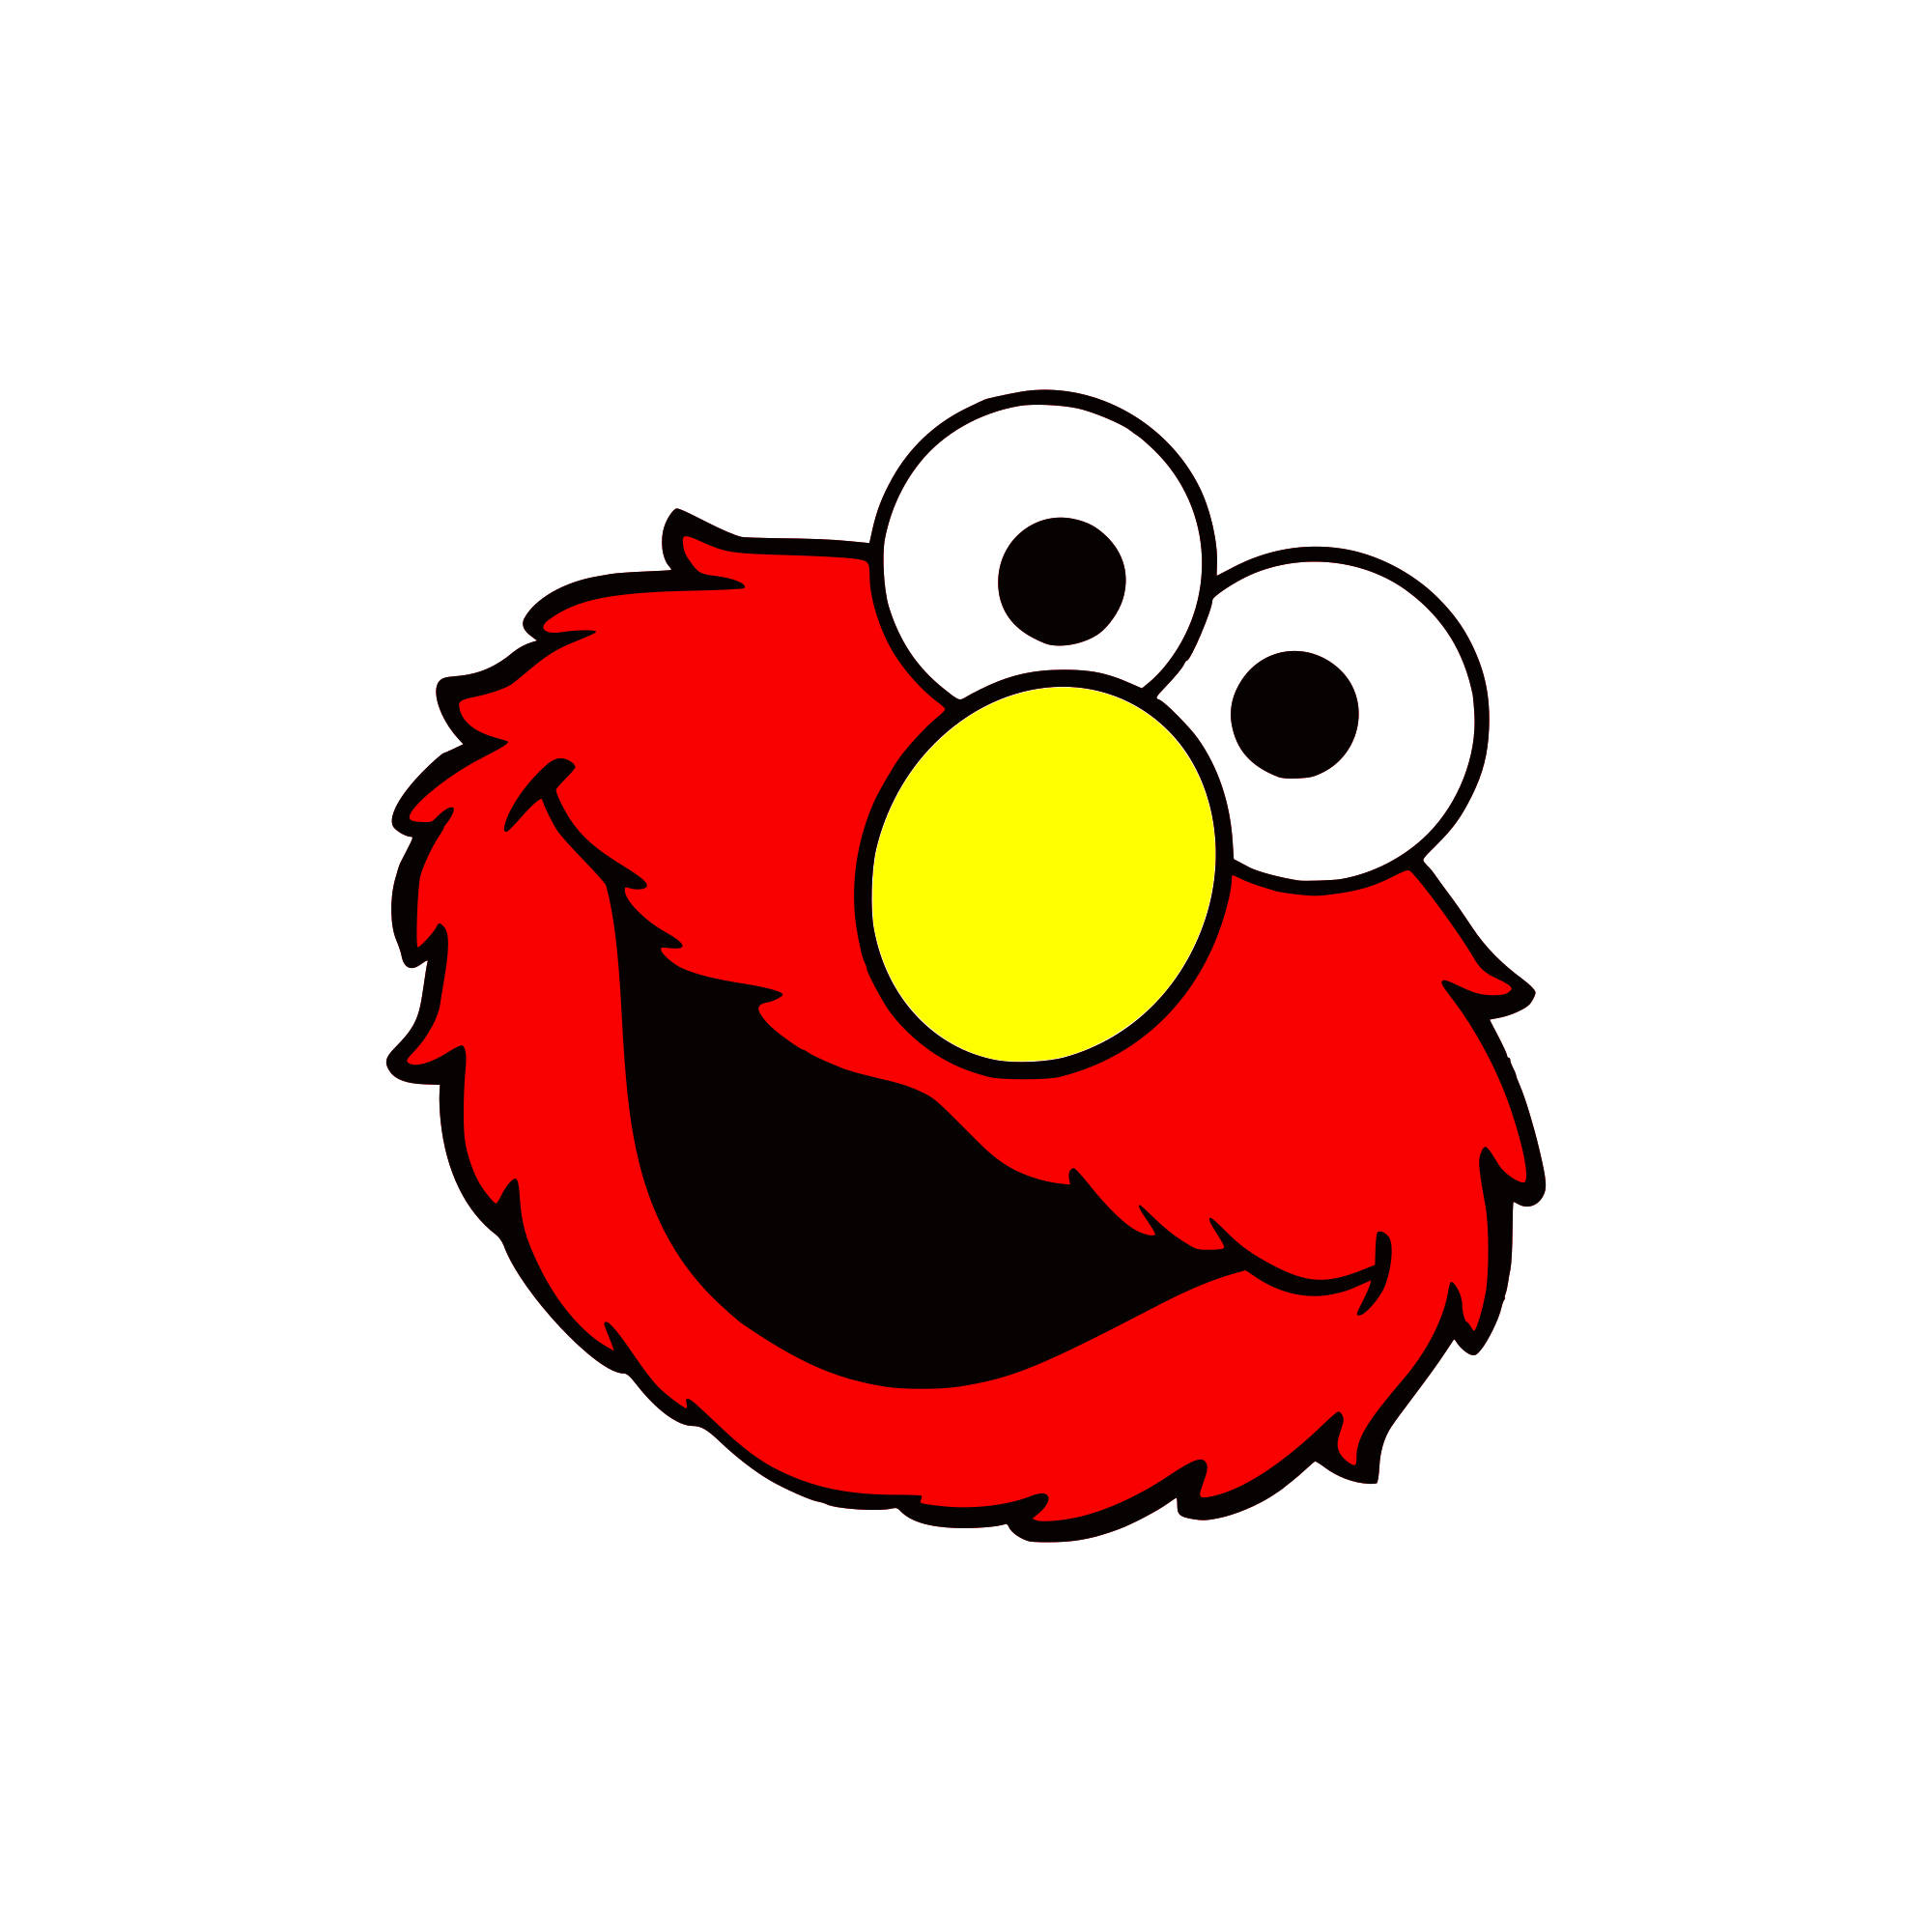 Elmo Face Clipart Elmo Face Clipart at G...